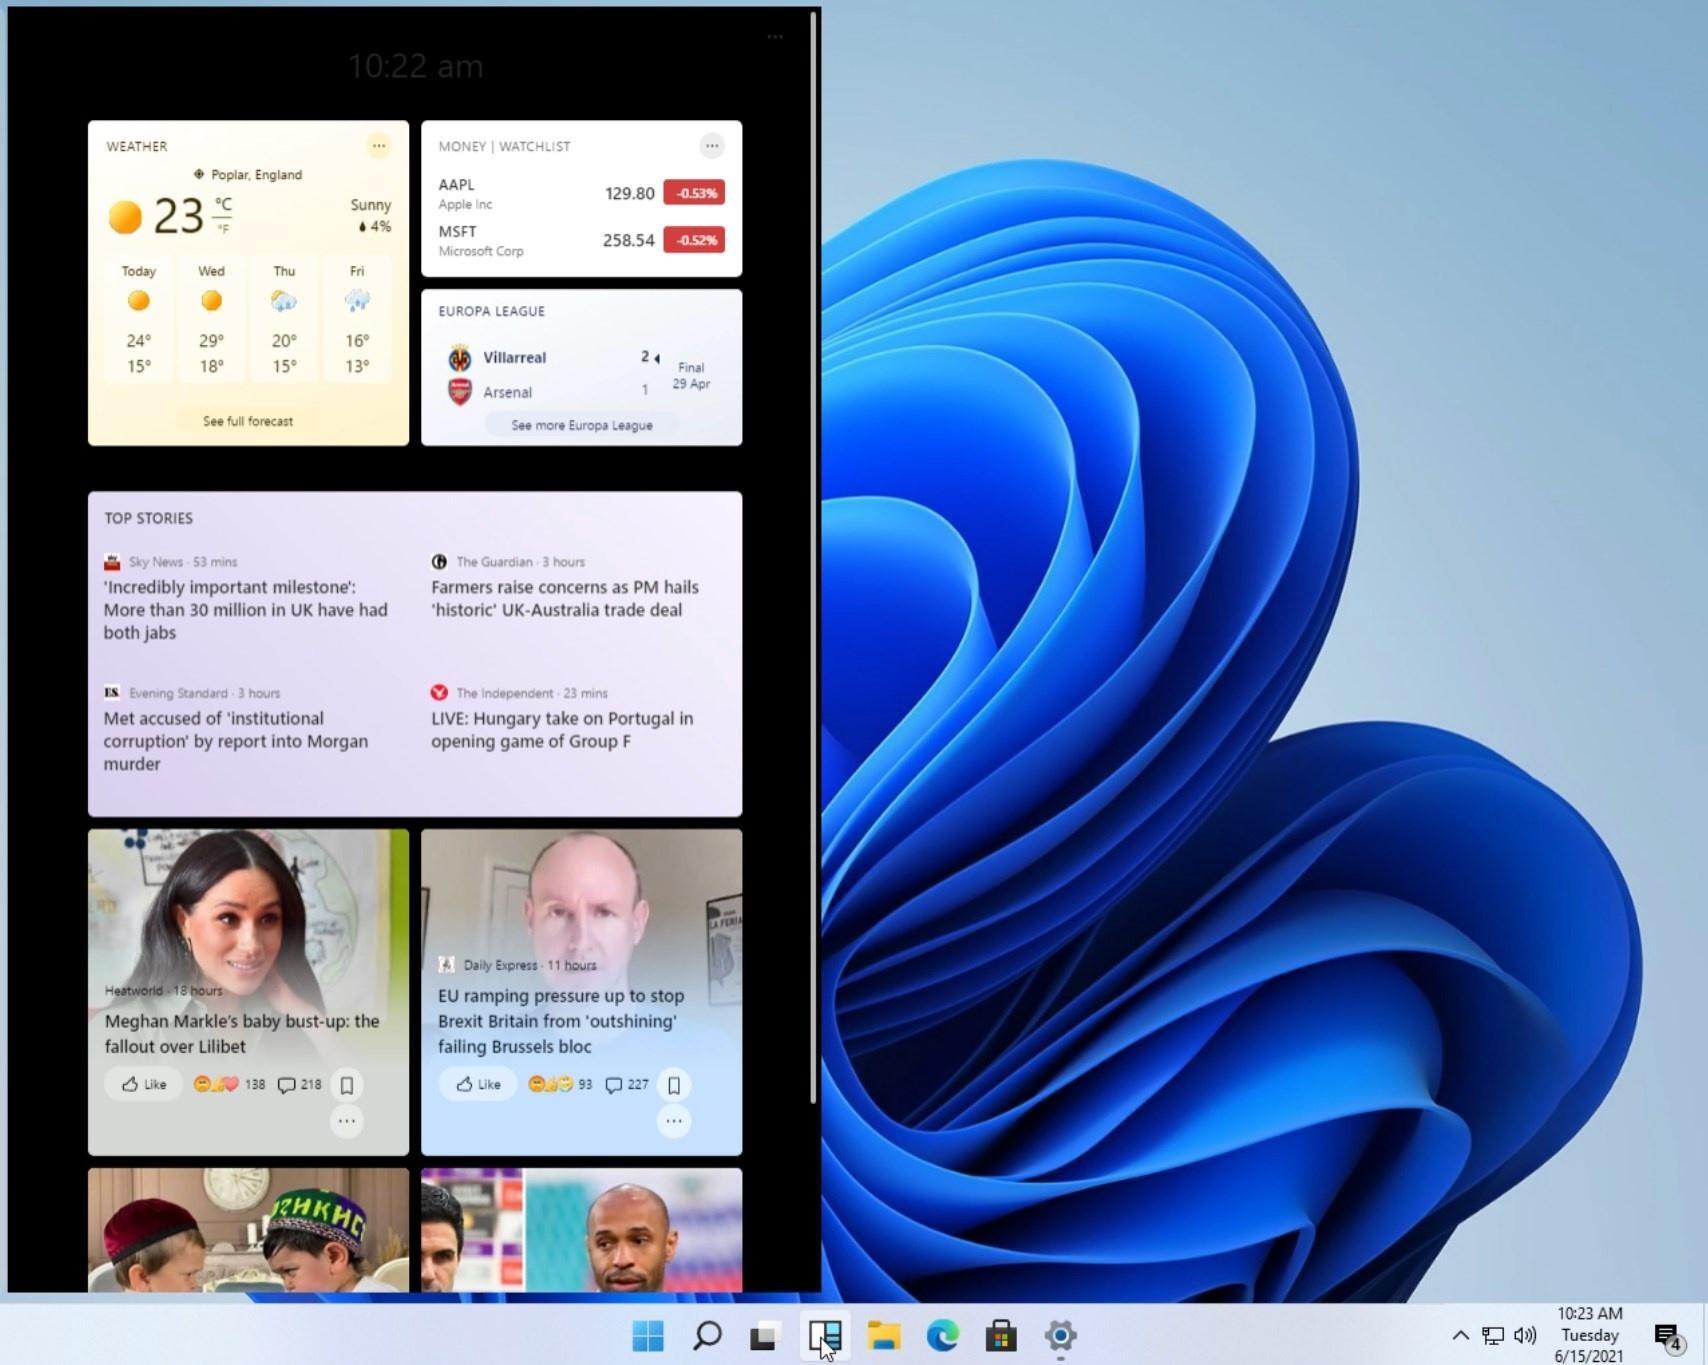 Media asset in full size related to 3dfxzone.it news item entitled as follows: Già on line gli screenshots del nuovo Sistema Operativo Windows 11 di Microsoft | Image Name: news32168_Microsoft-Windows-11-Screenshot_2.jpg